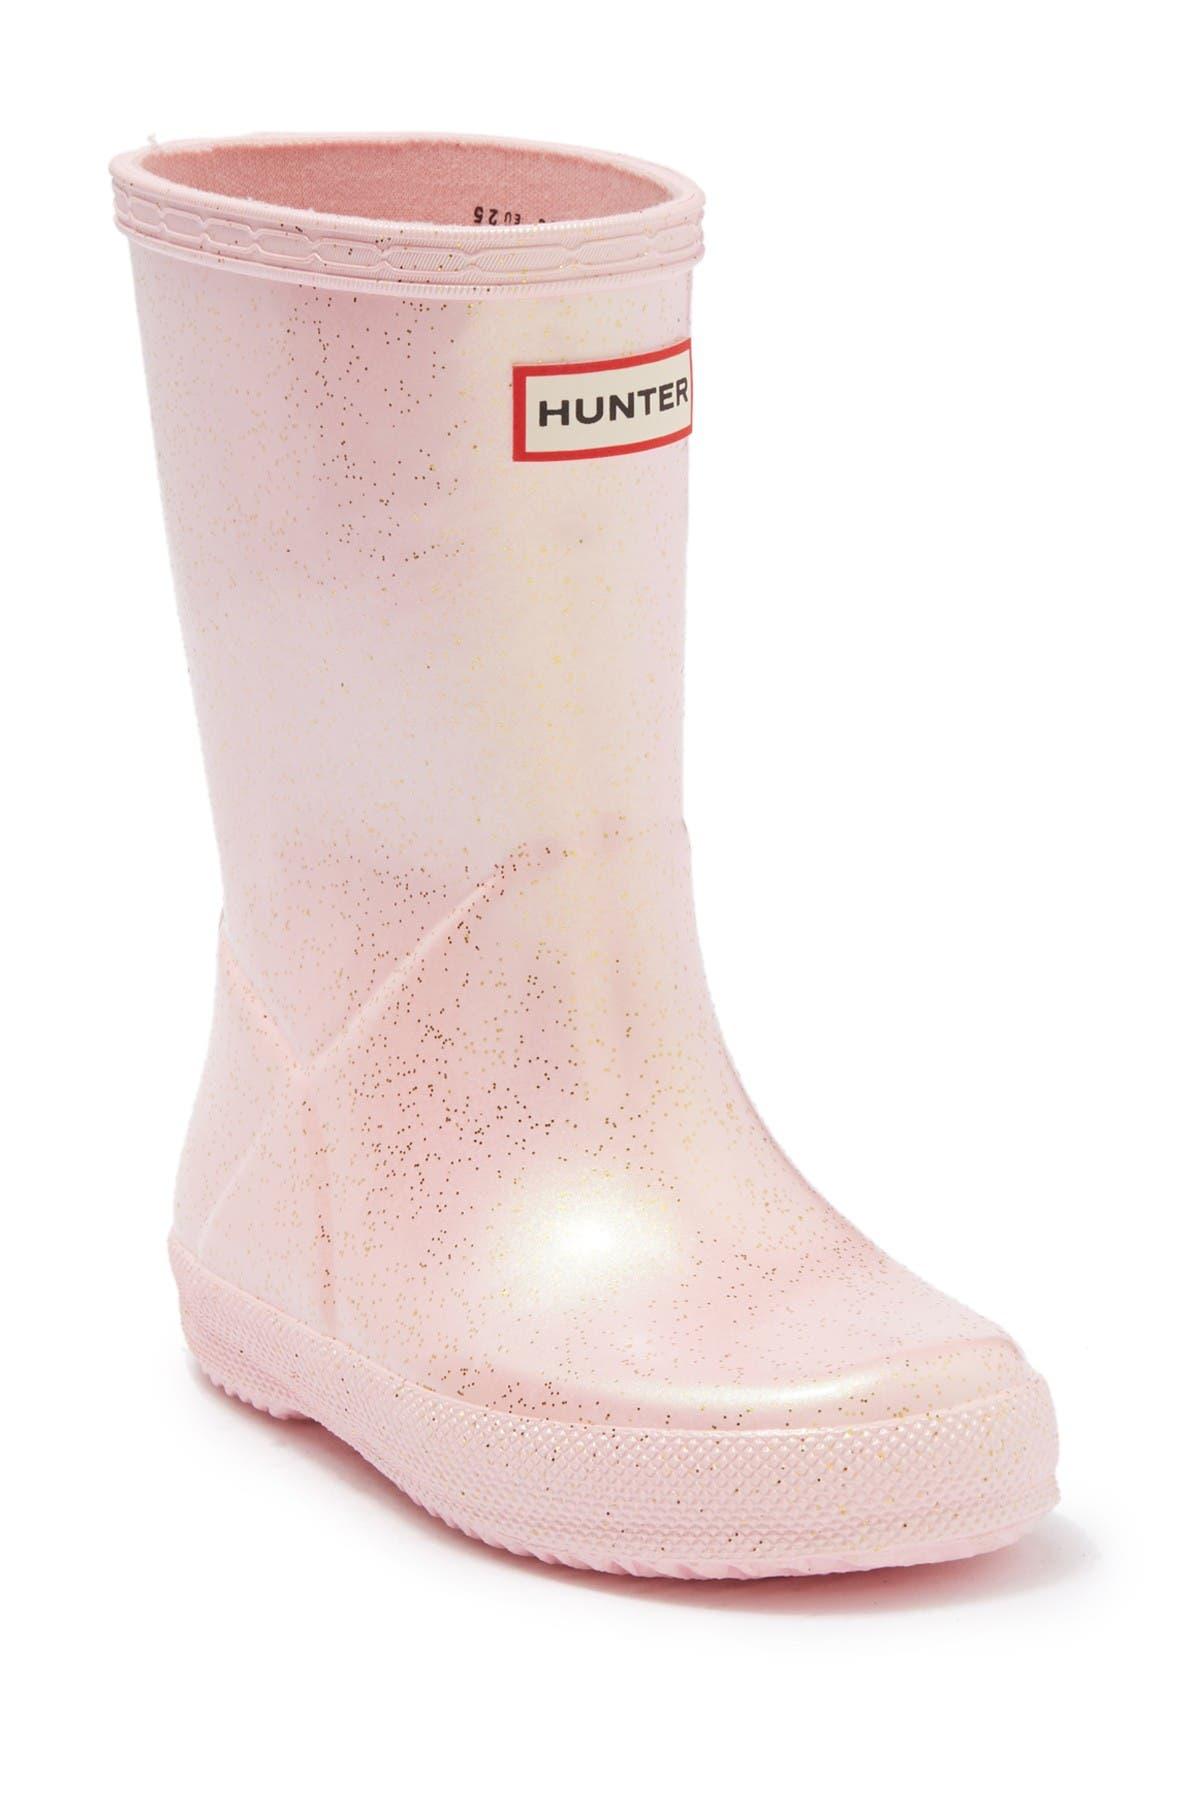 Image of Hunter Classic Supernova Glitter Waterproof Rain Boot